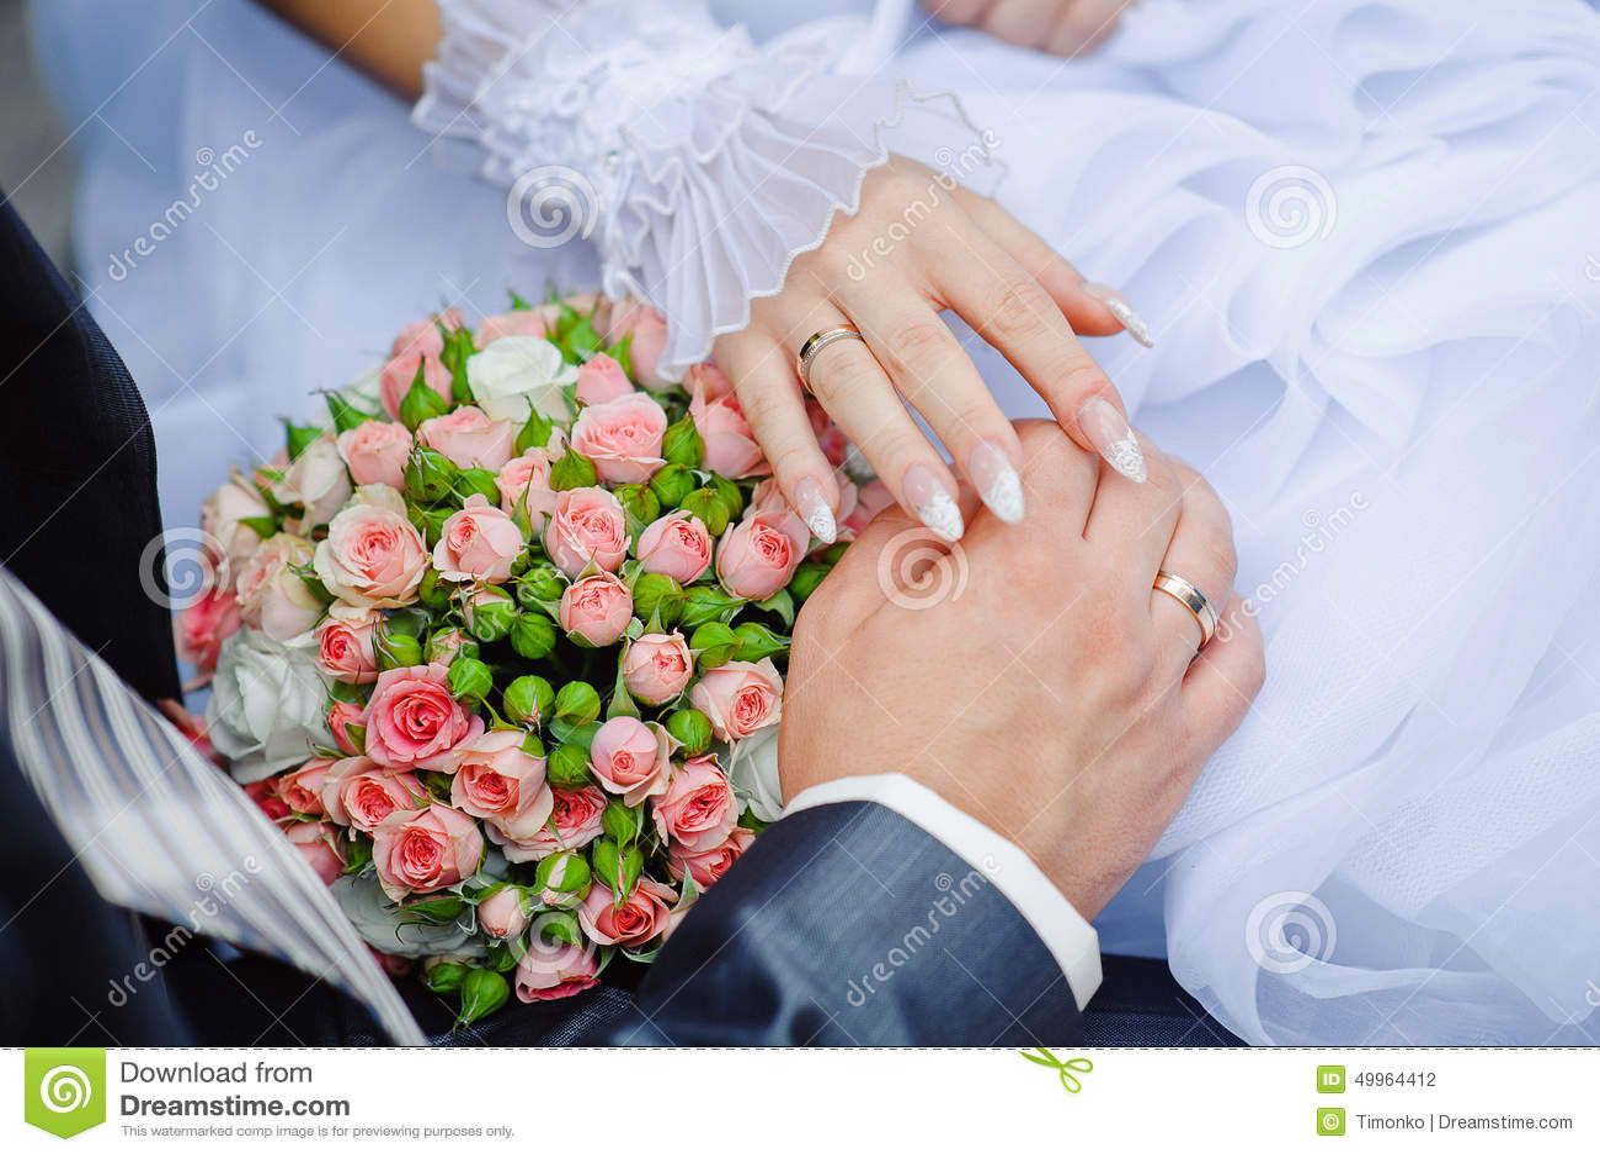 Romantic couple closeup with a creamy climax 9